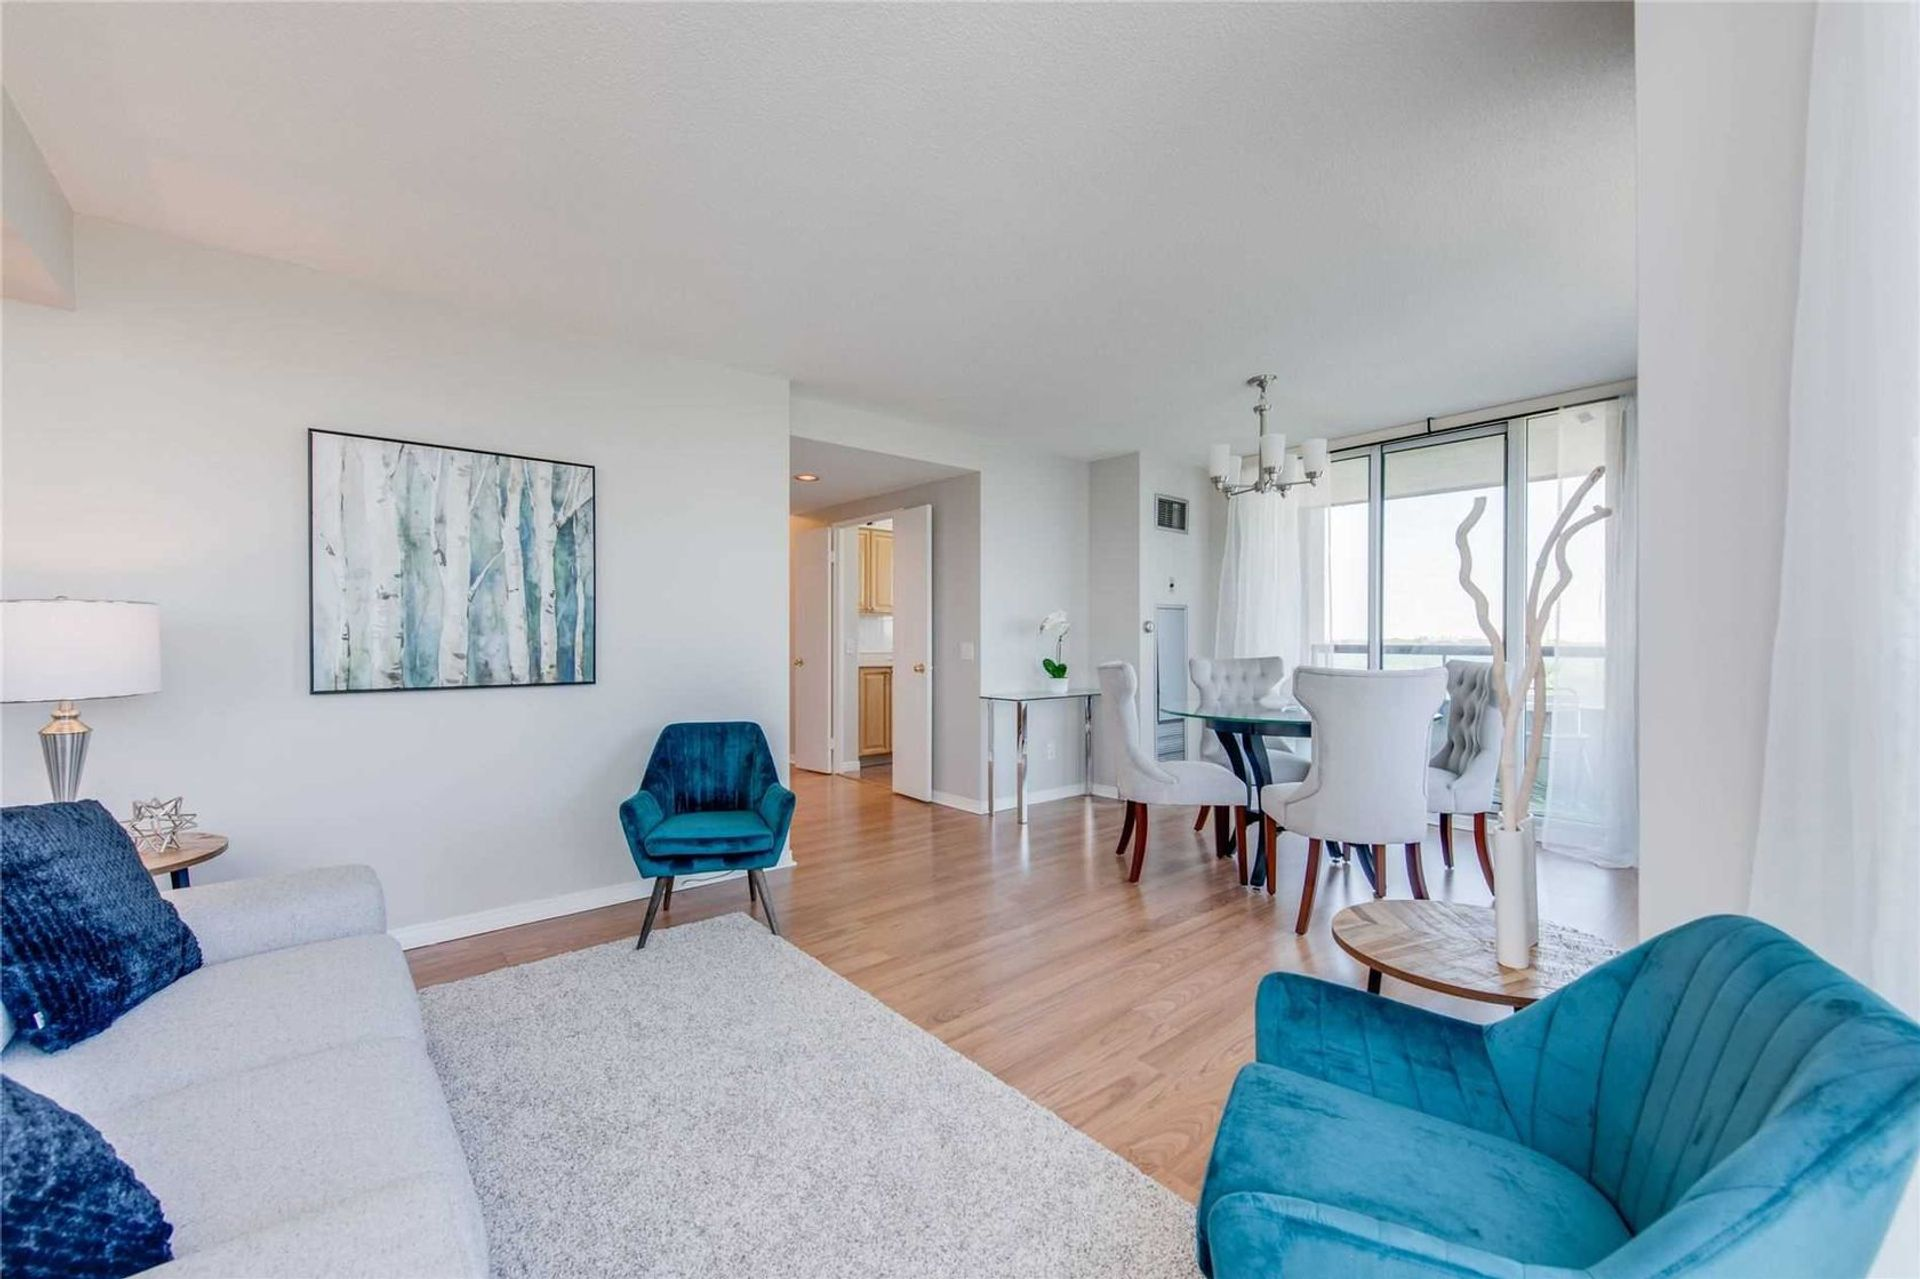 238-doris-ave-willowdale-east-toronto-04 at 1705 - 238 Doris Avenue, Willowdale East, Toronto